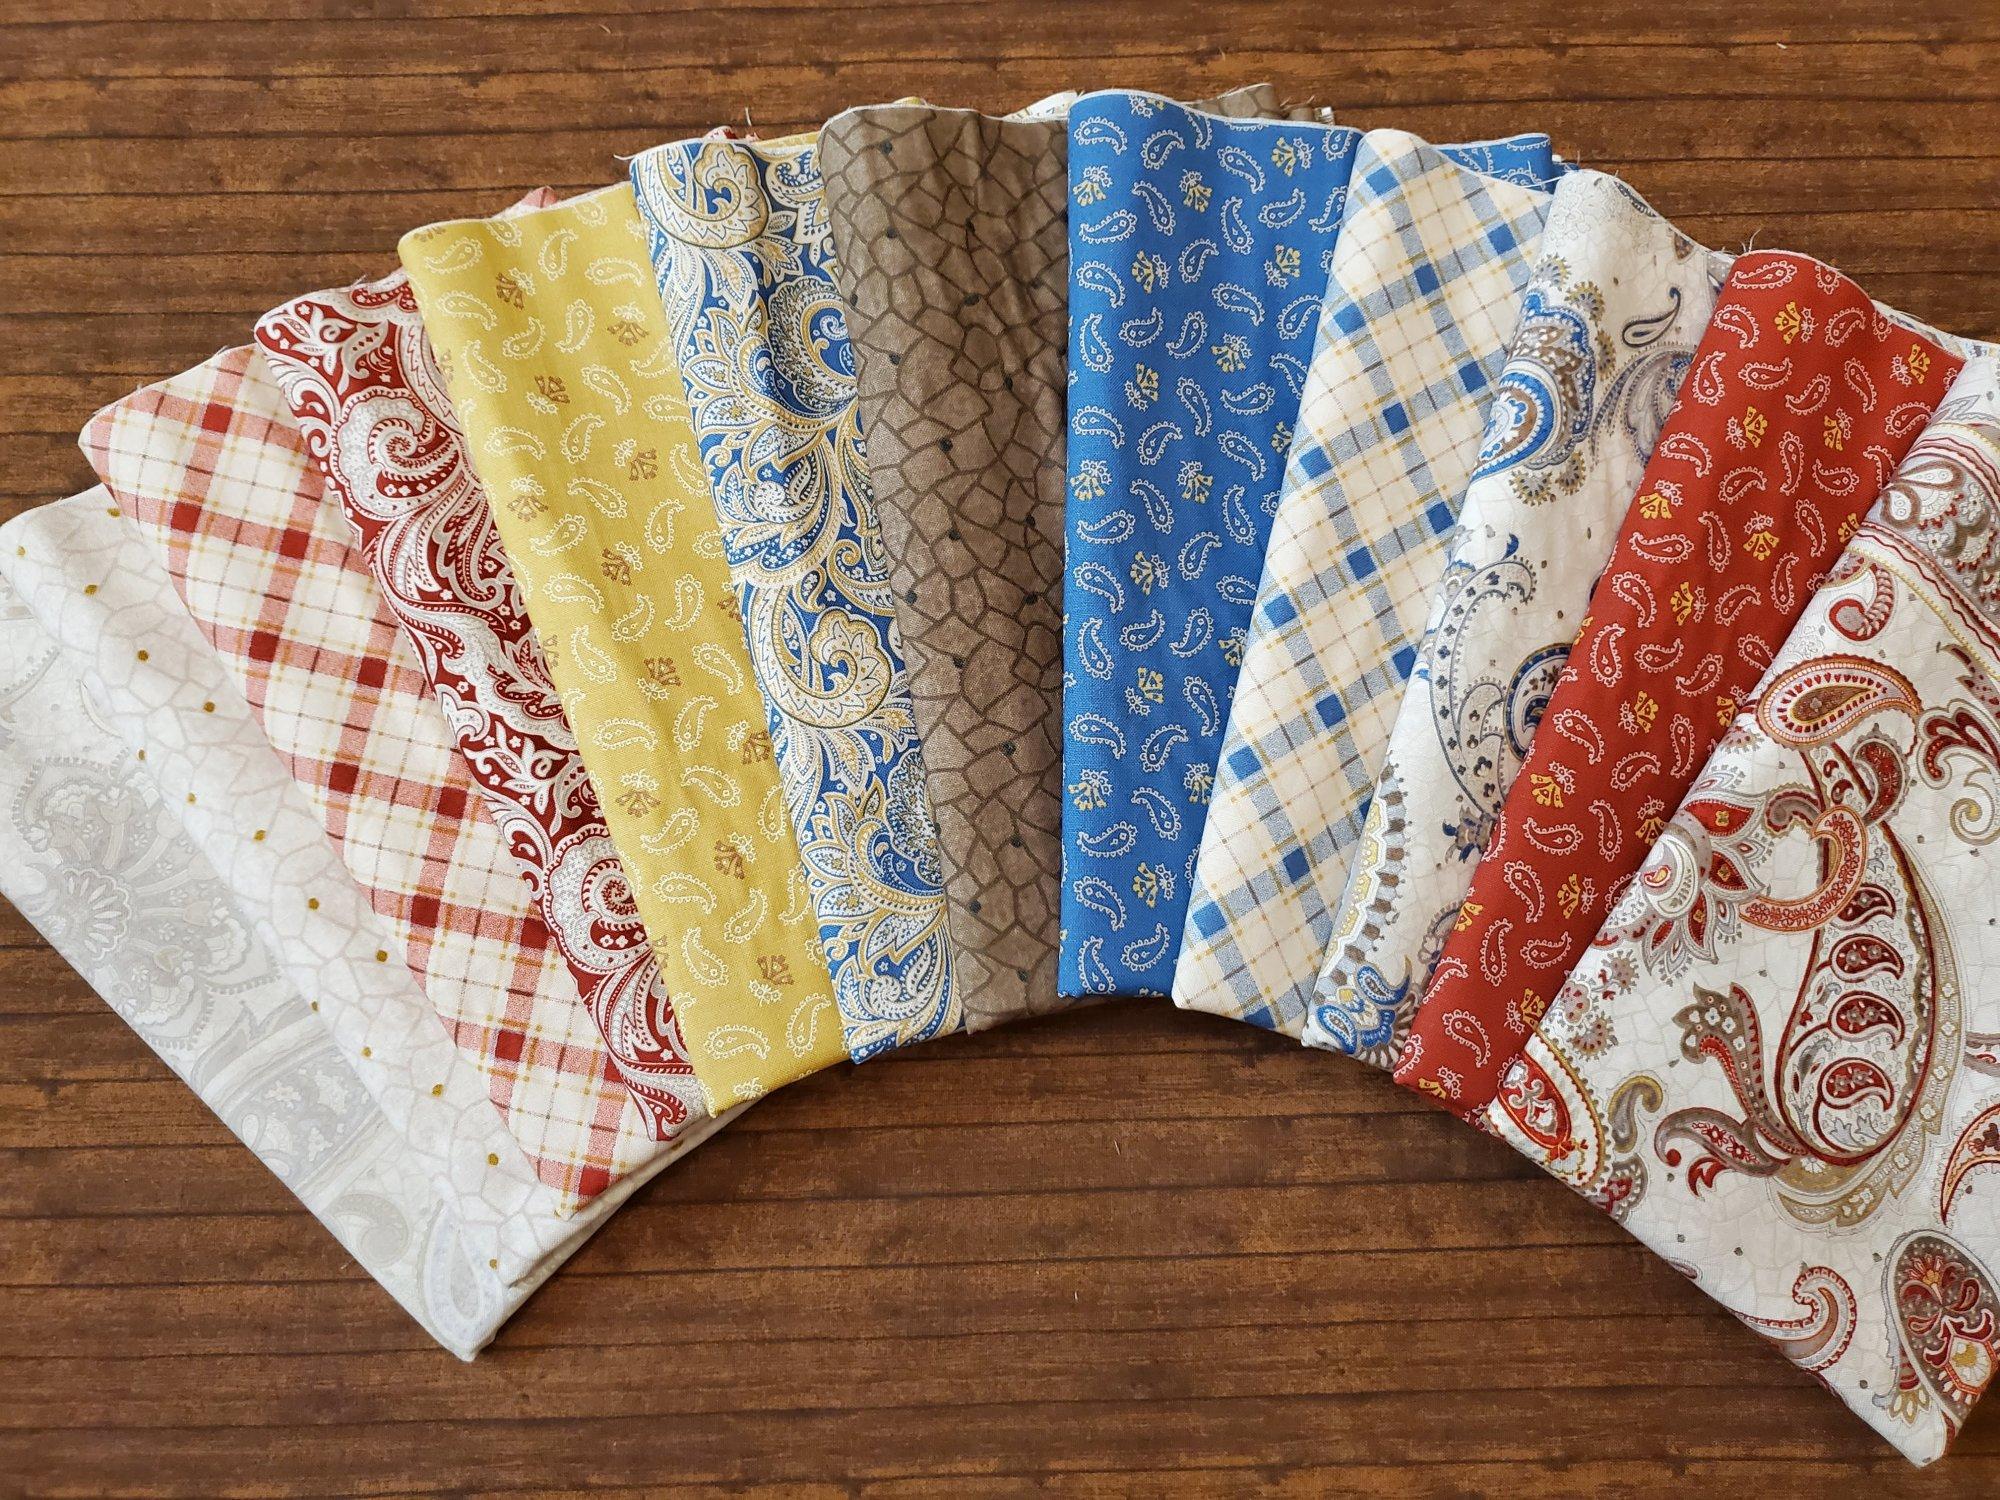 Paisley Palette  by Laura Berringer for Marcus Fabrics - 12 Piece Half Yard Bundle Pack